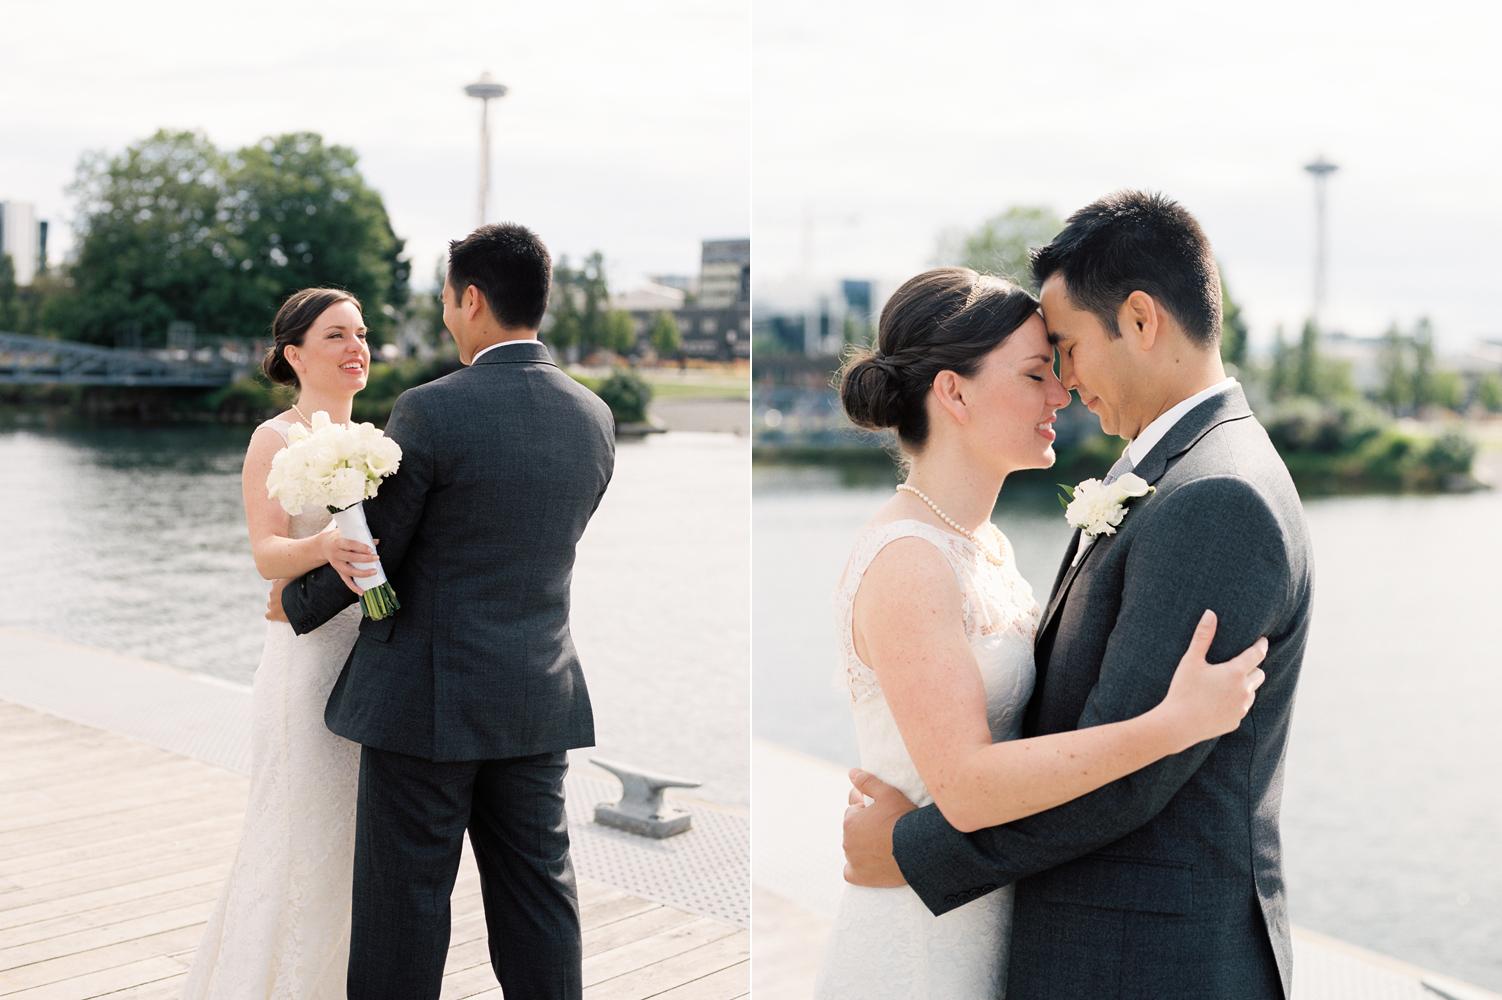 seattle south lake union space needle wedding.jpg